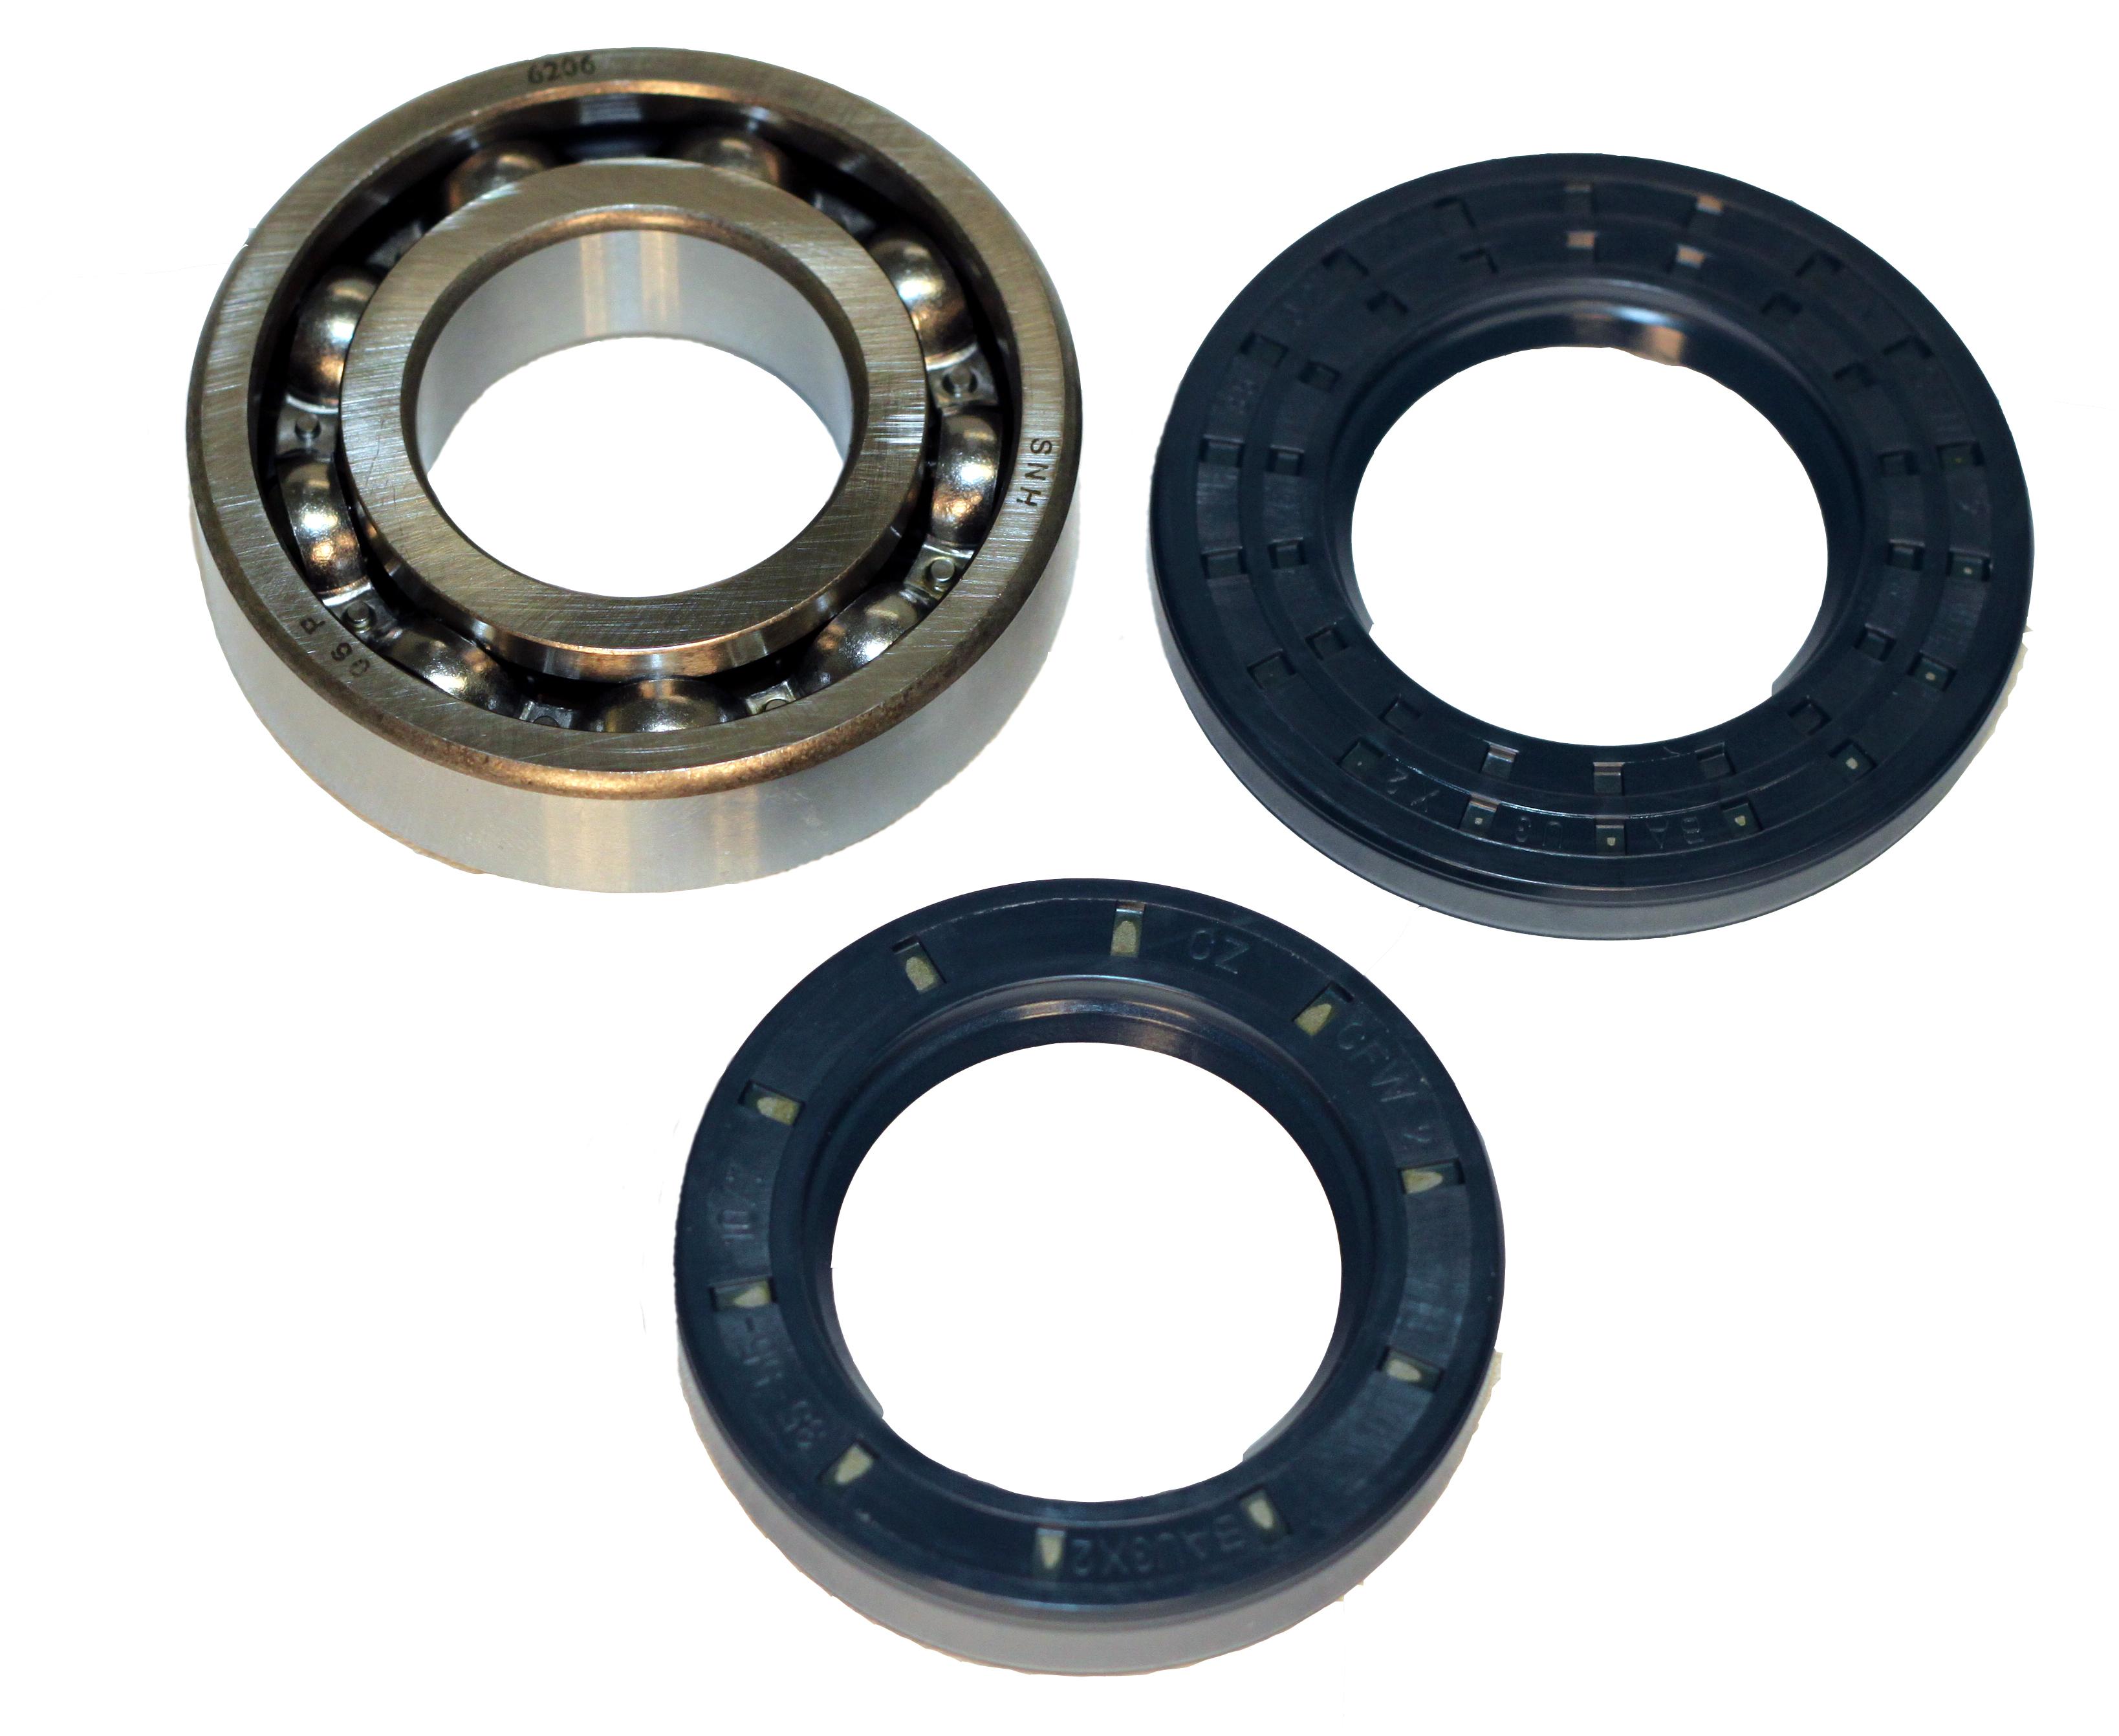 Rep.sats svänghjulskåpa B20, B21, B23, B25, B30, MD21 / 32 m. 270-, 280- och 290-drev